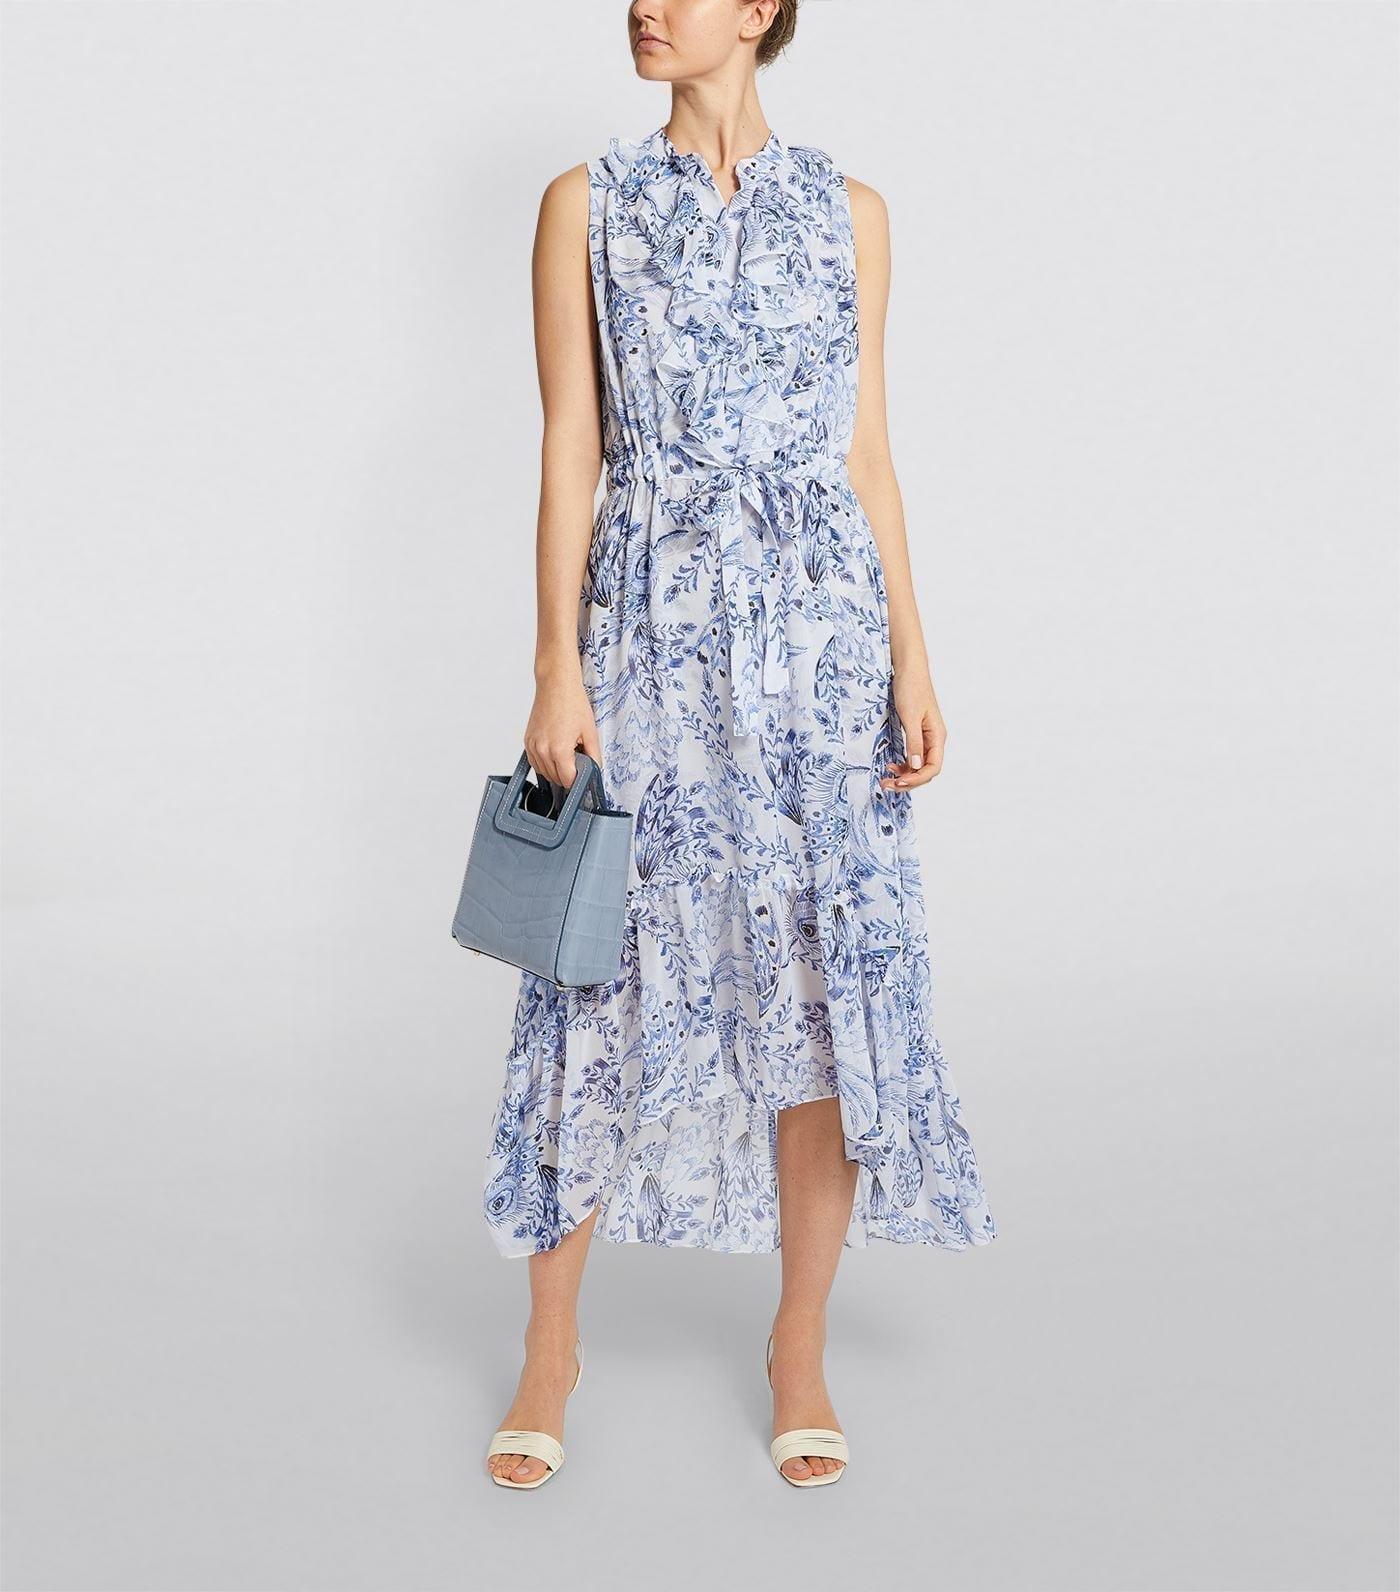 MISA LOS ANGELES Audra Asymmetric Hem Dress